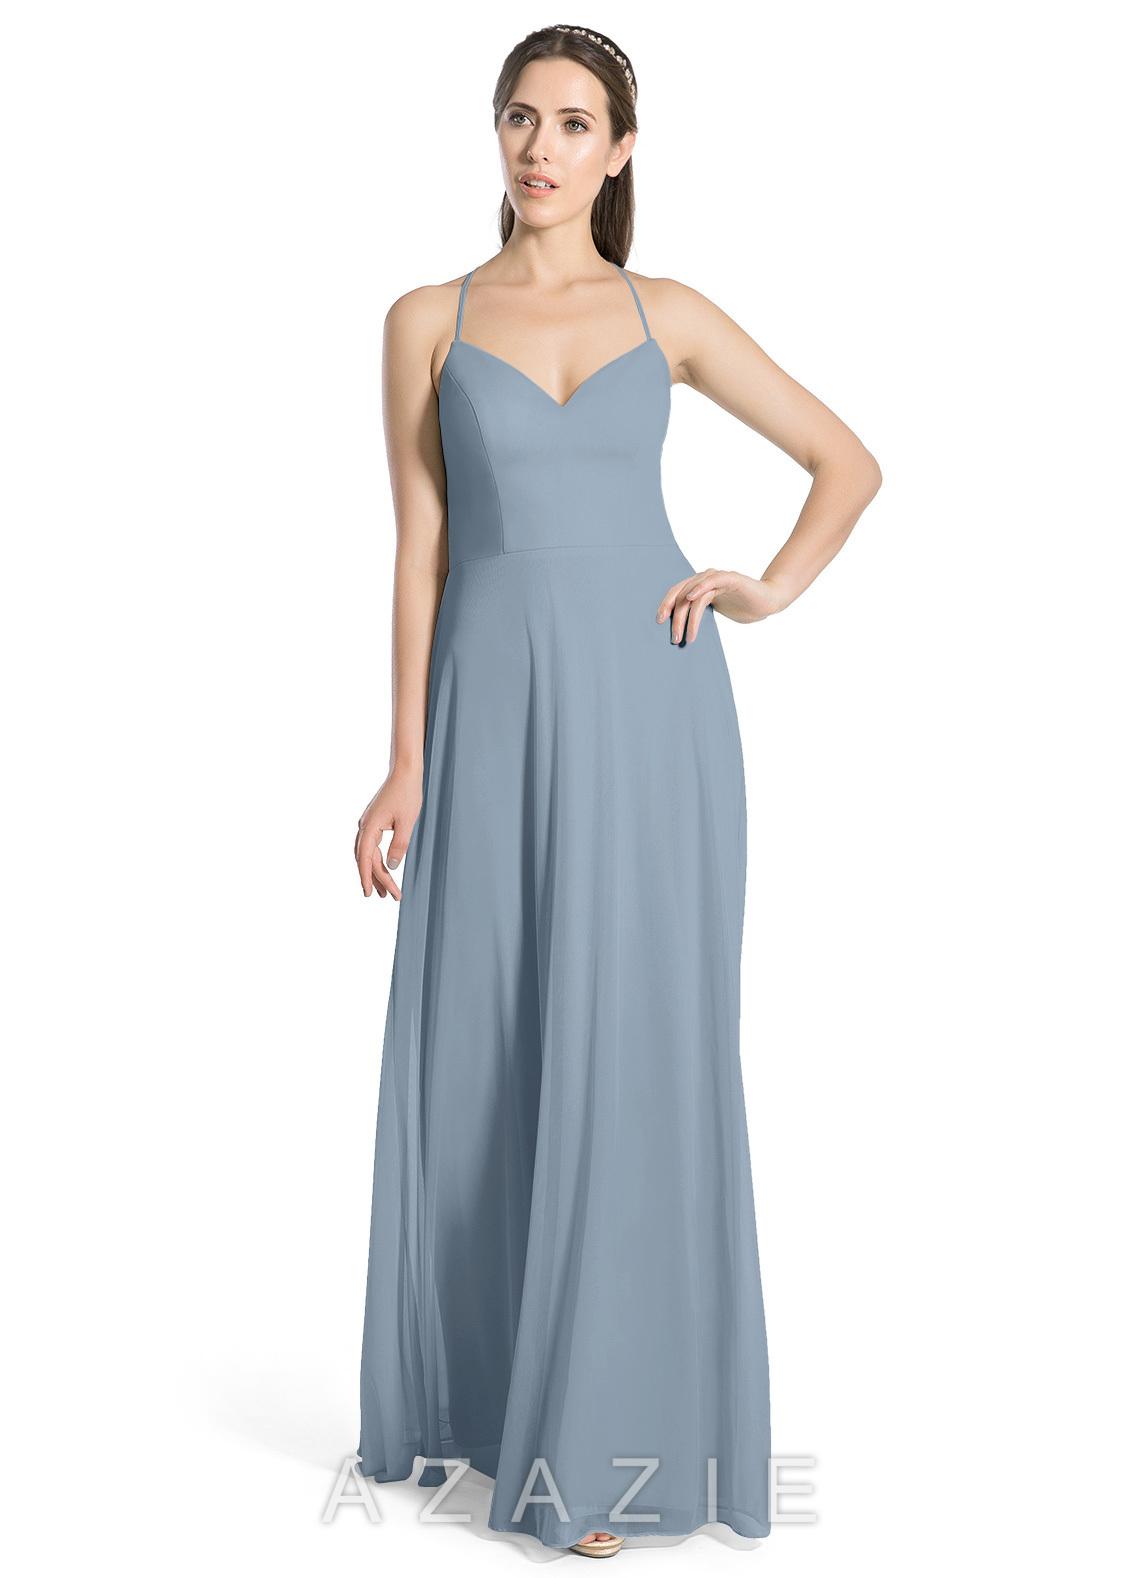 defde1c4bd Azazie Kelis Bridesmaid Dresses. FABRIC  Mesh